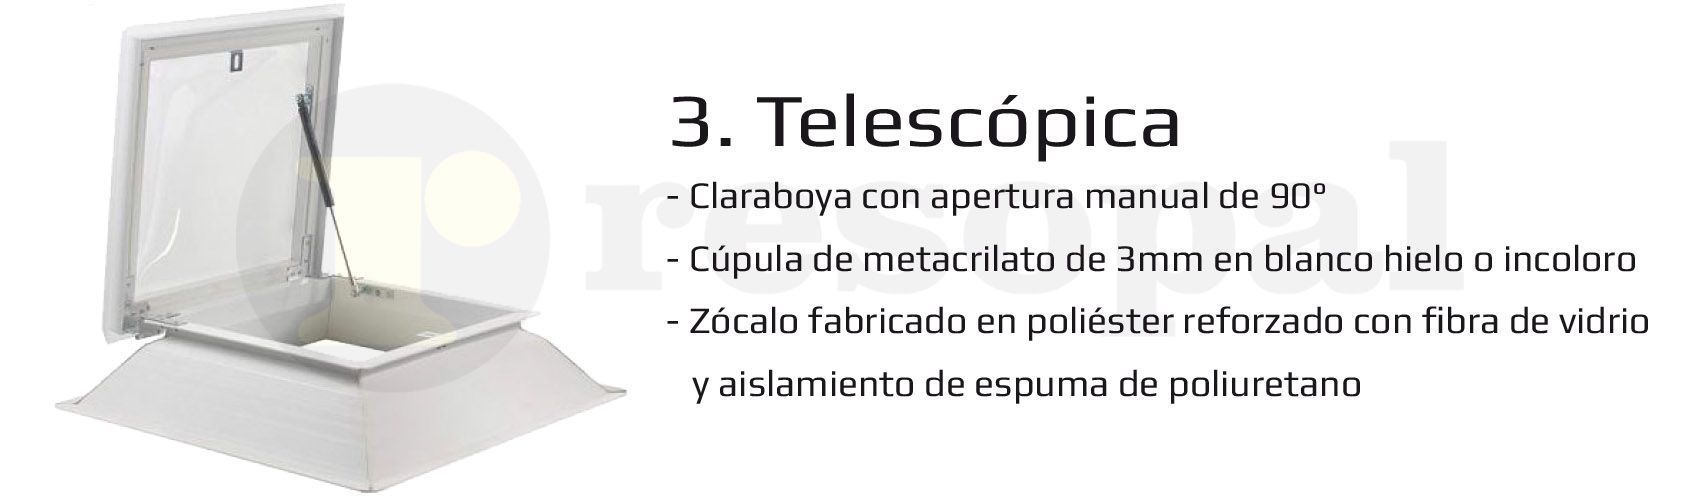 Claraboya Telescópica